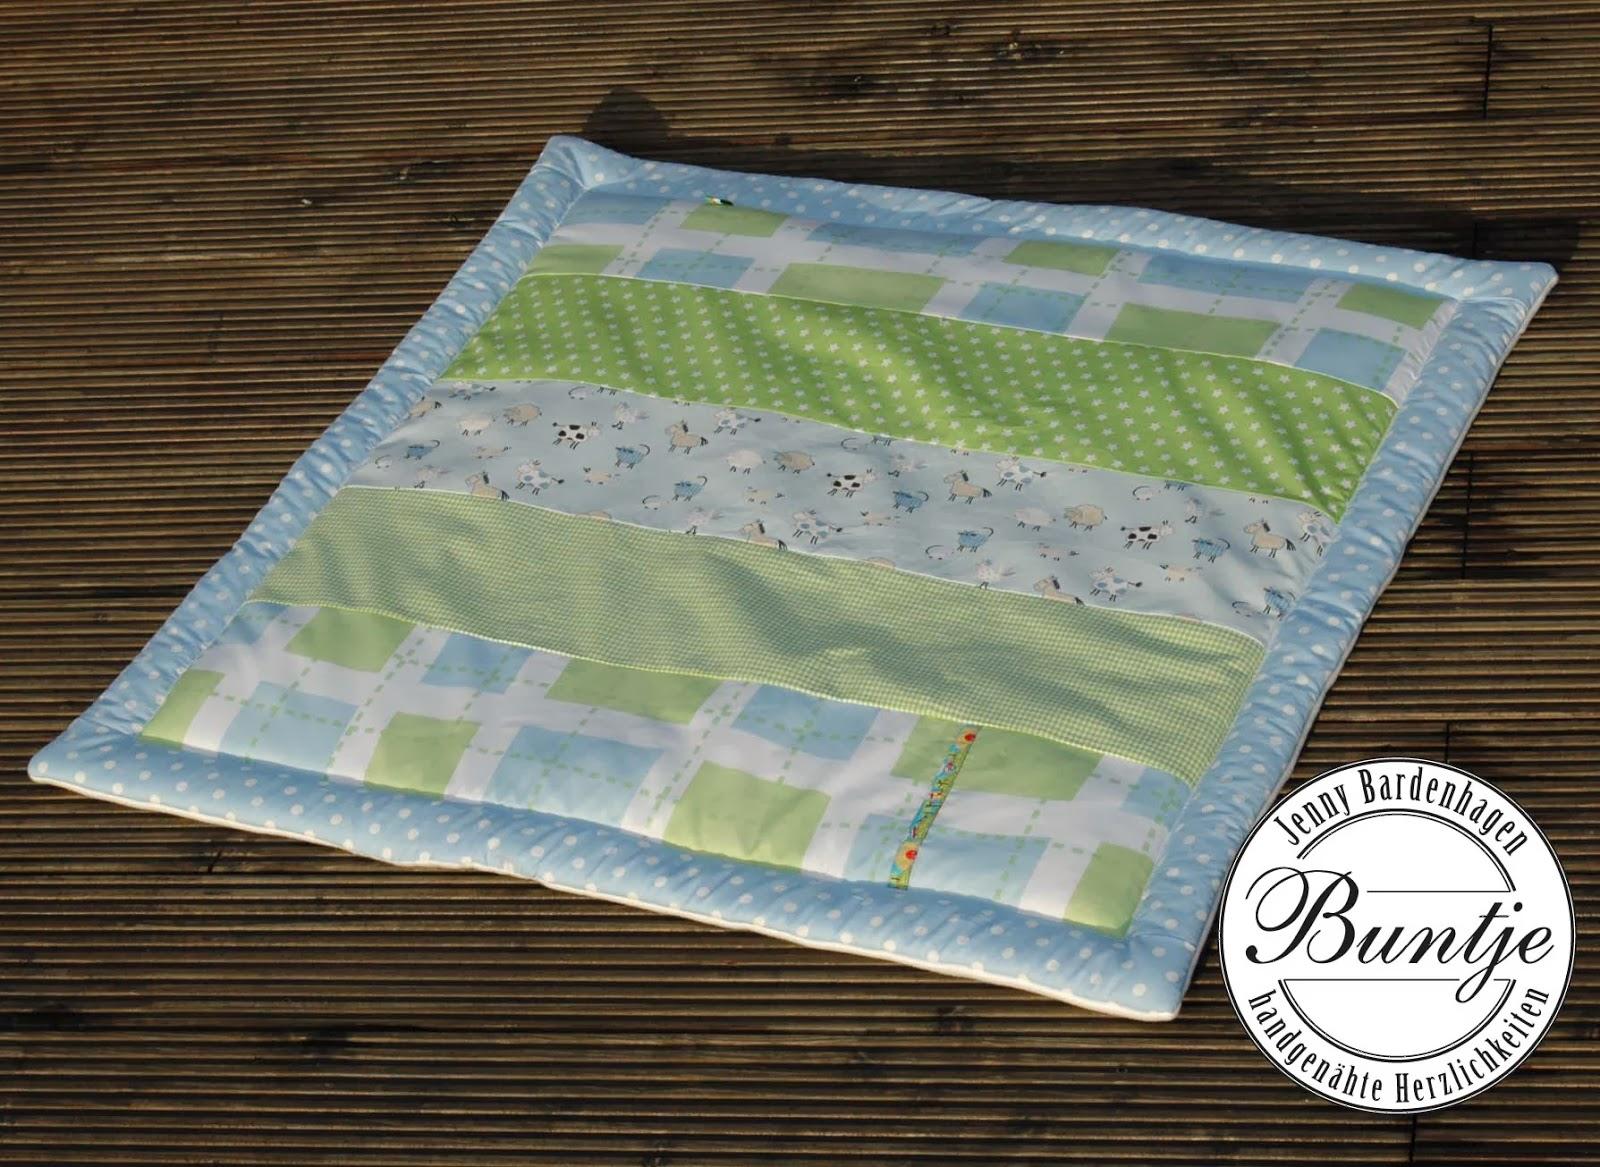 Krabbeldecke Decke Baby Junge Name Geschenk Geburt Taufe hellblau grün Bauernhof Tiere Baumwolle Fleece dick handmade Buntje Nähen